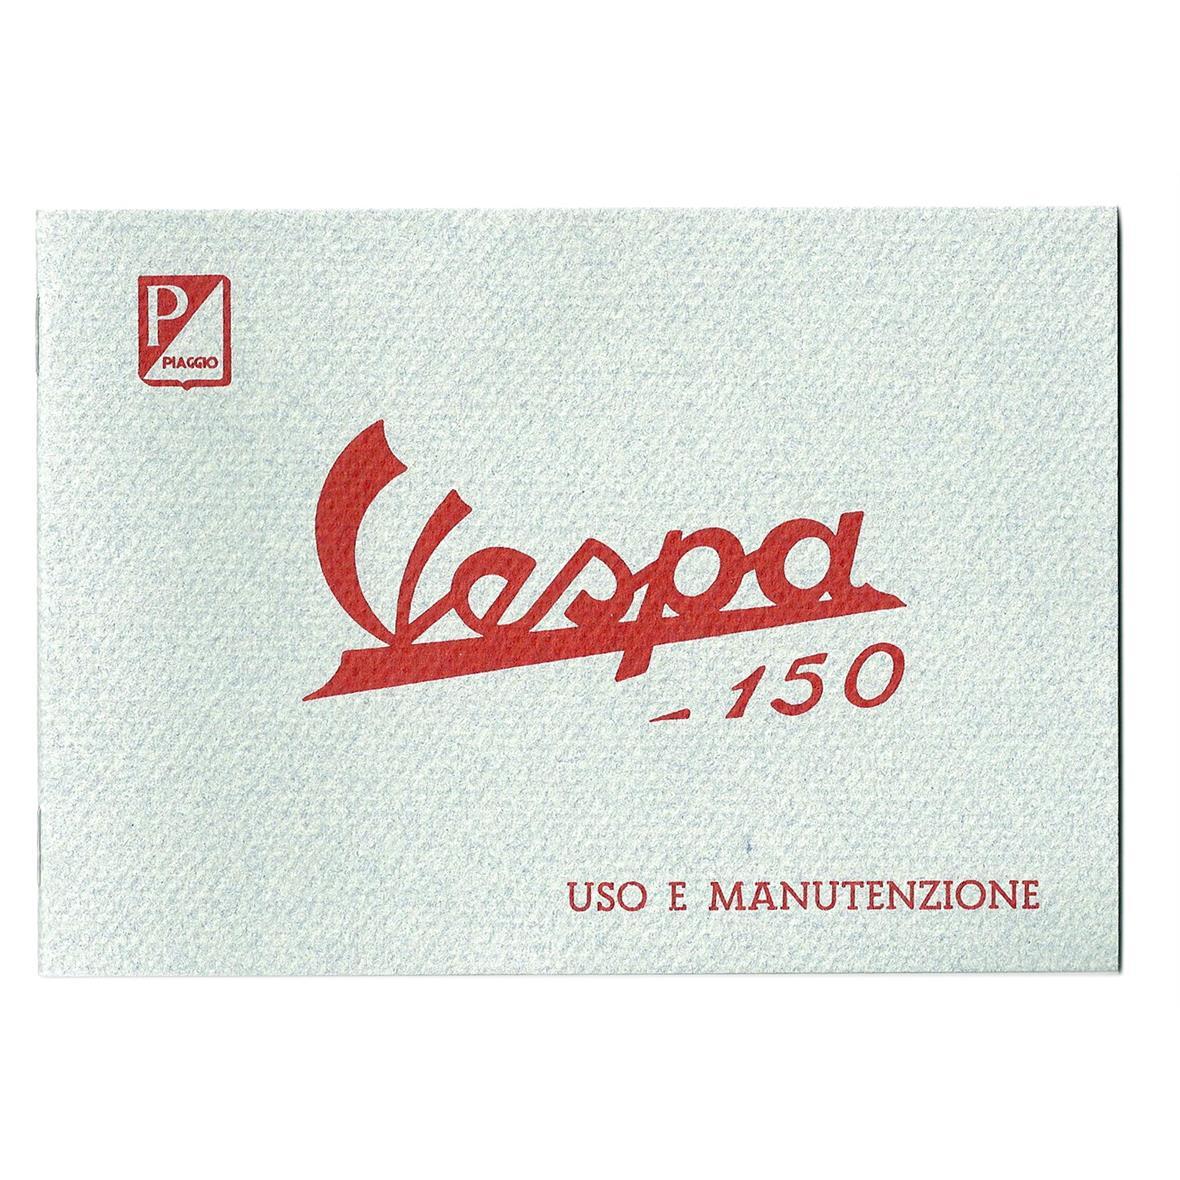 Product Image for 'Instruction Manual PIAGGIO Vespa 150 1957Title'